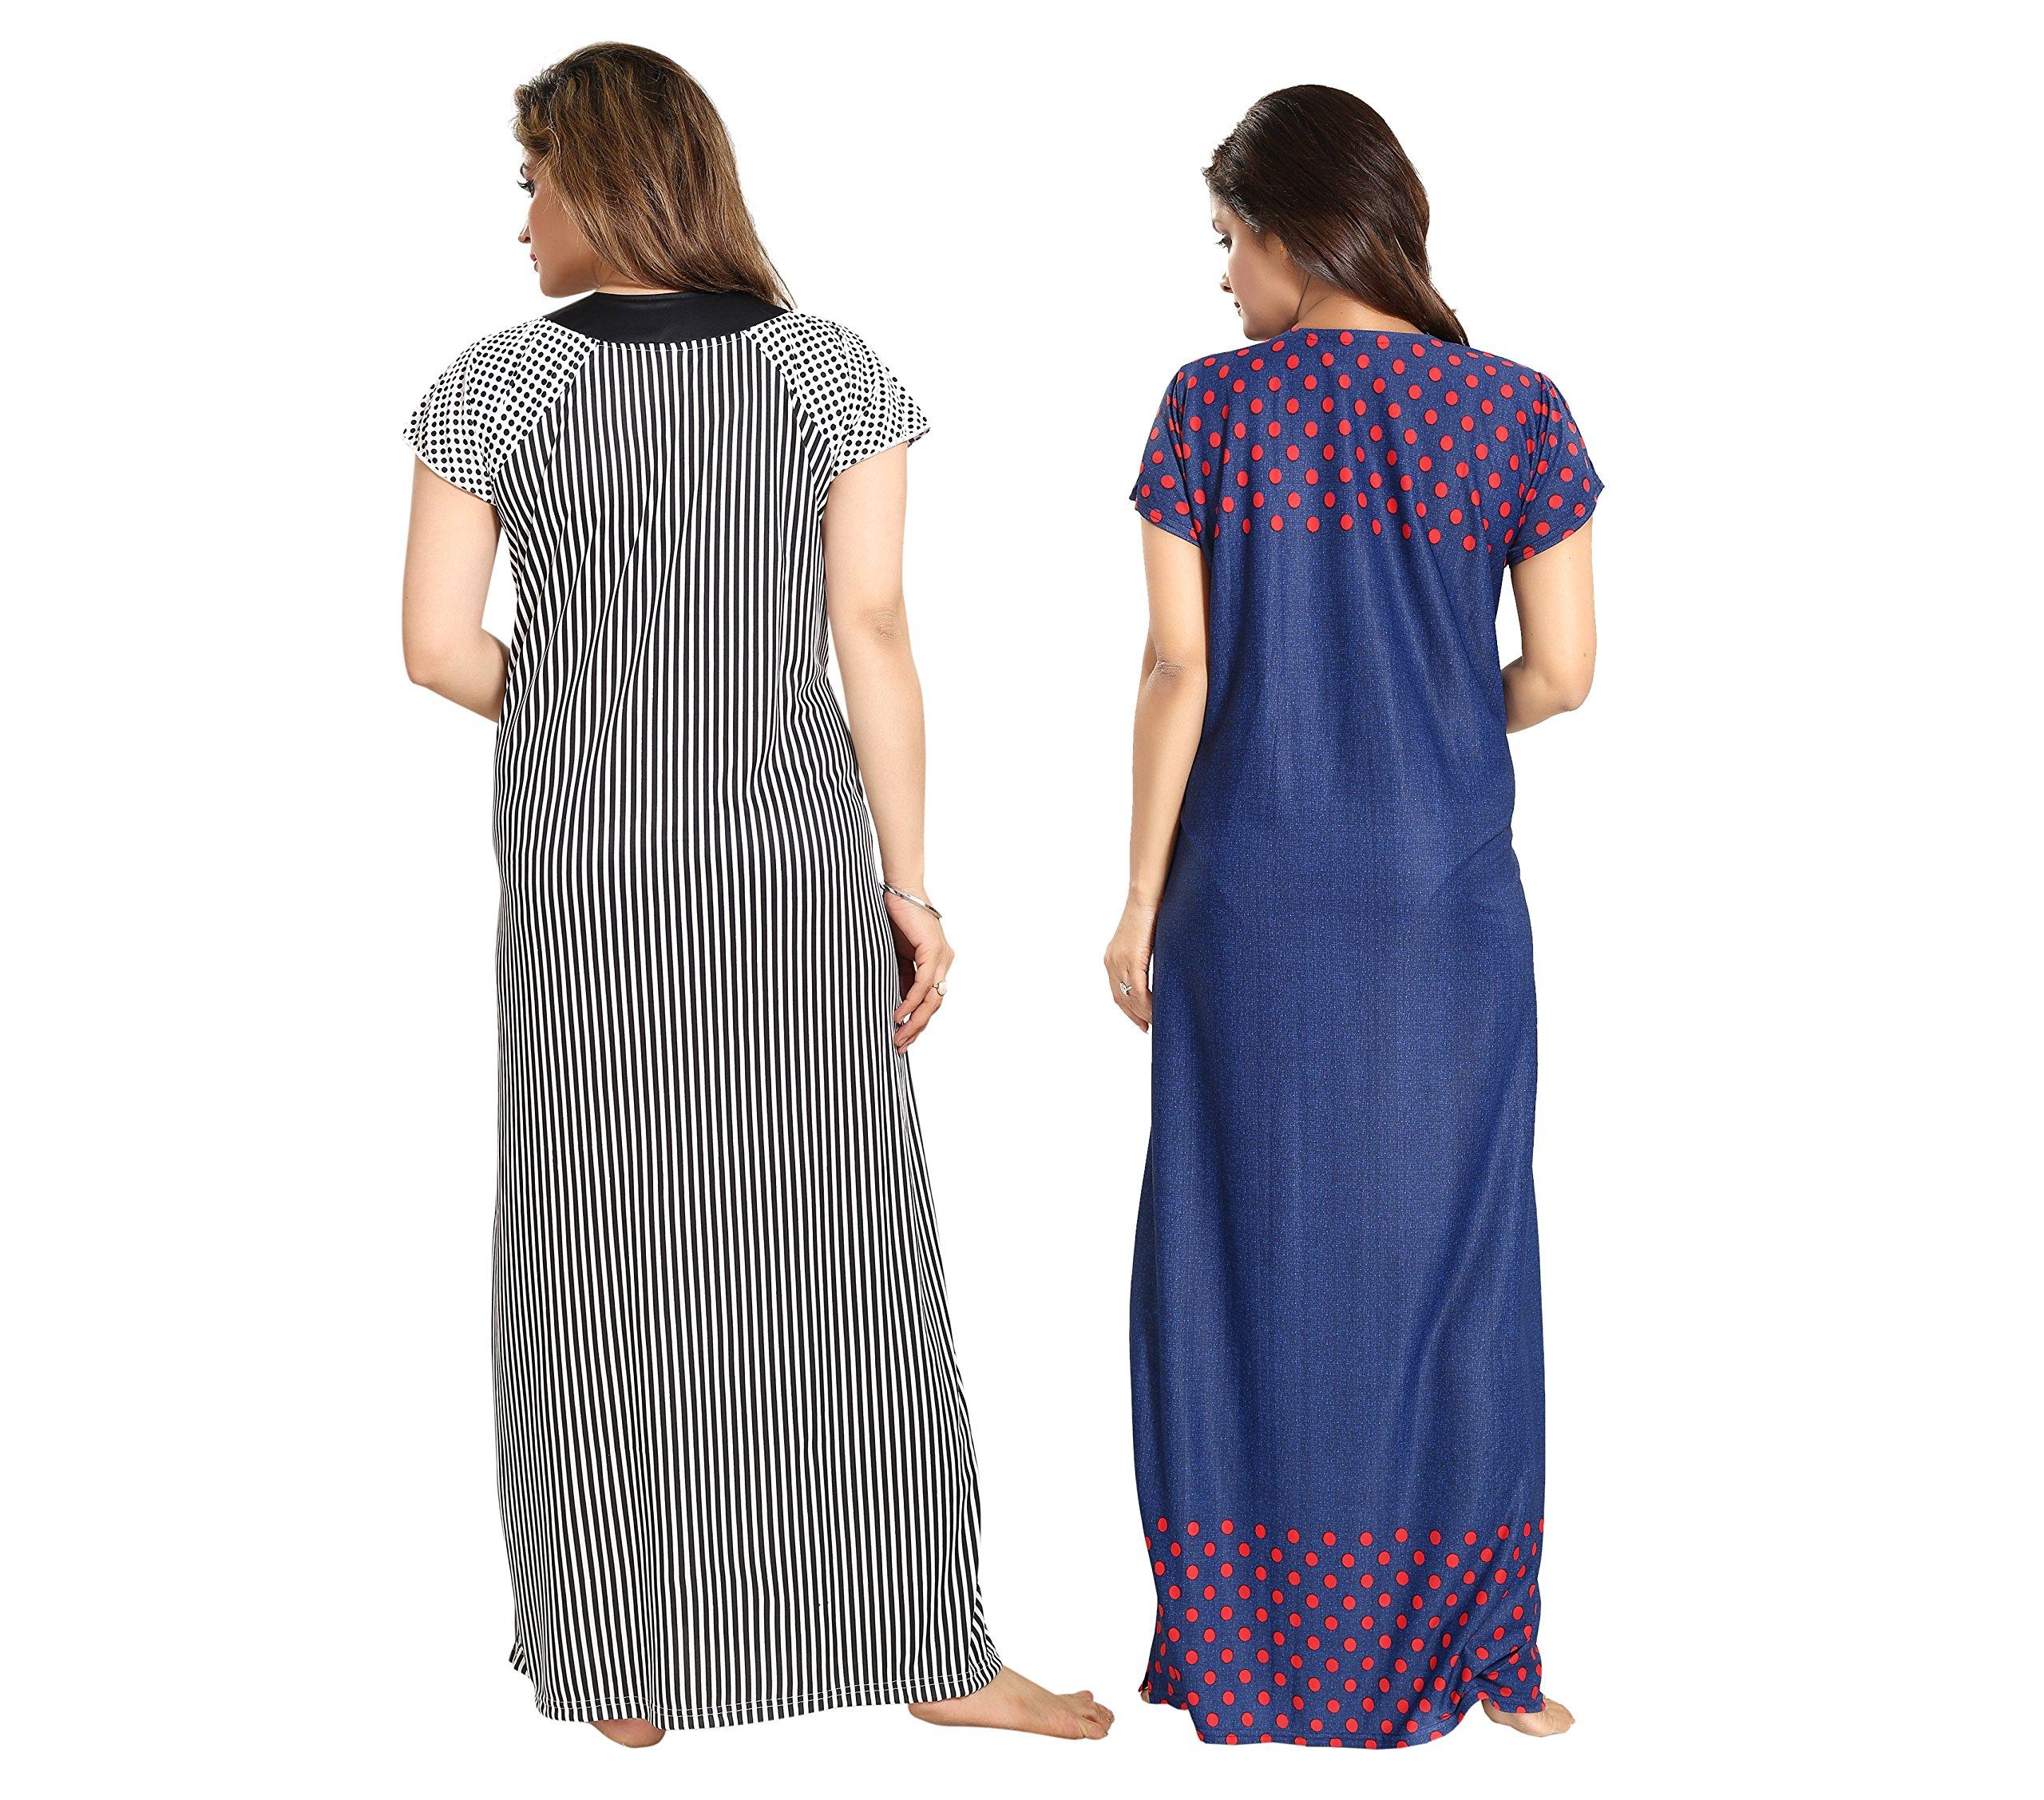 6284a2f497 Tucute Women   Girls Beautiful Denim Print Base with Red Polka Dott s +  Black-n-White Line Print Nighty   Night Gown ...